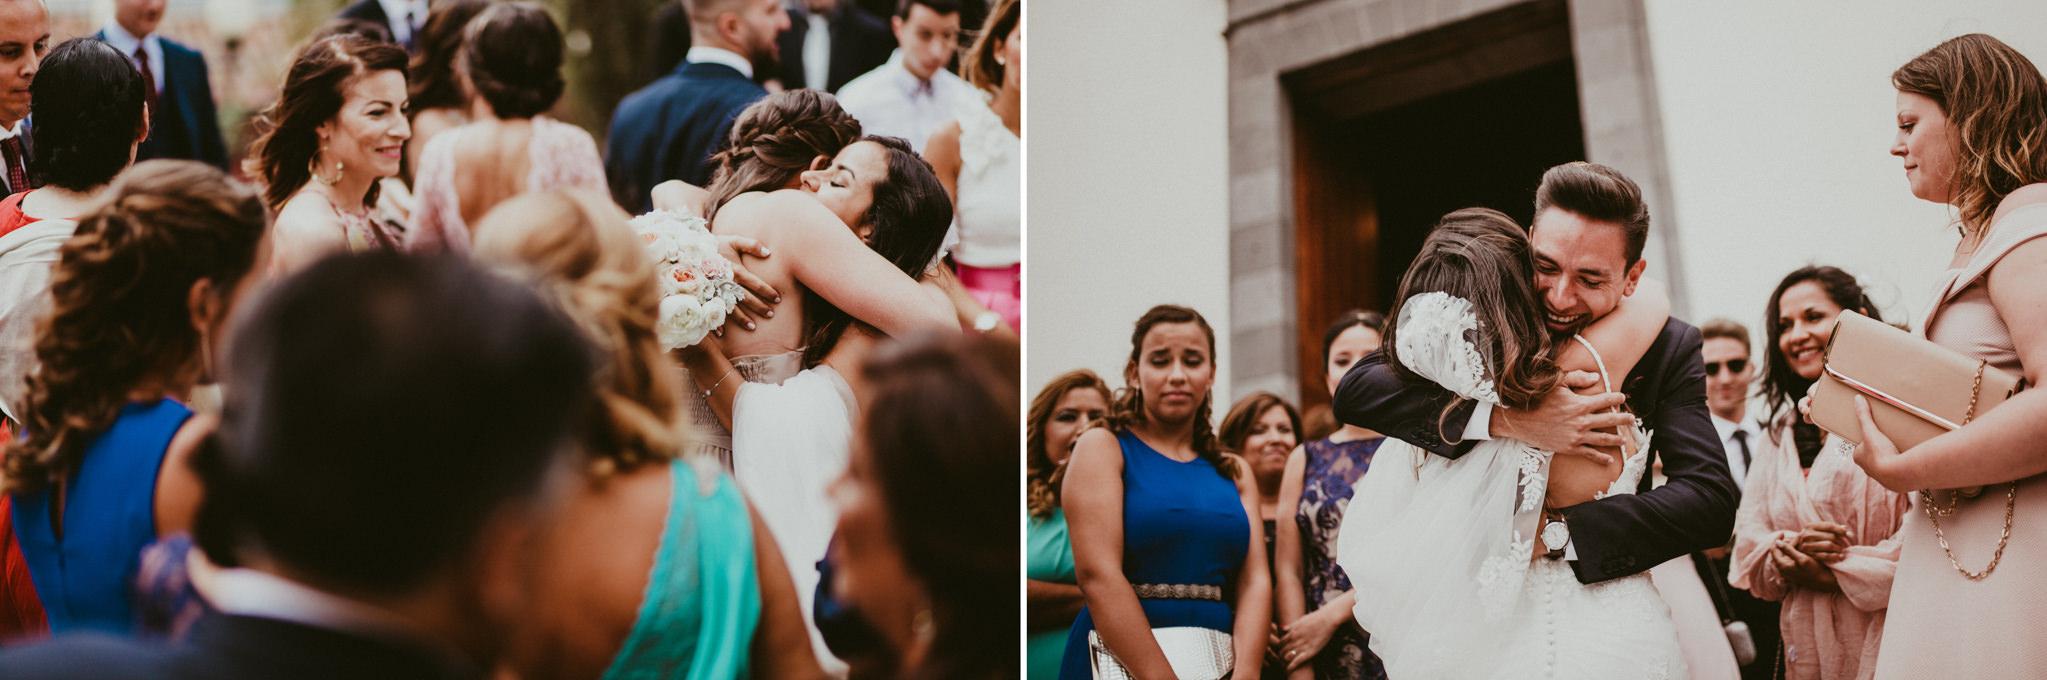 Jessica+Oscar-wedding-123